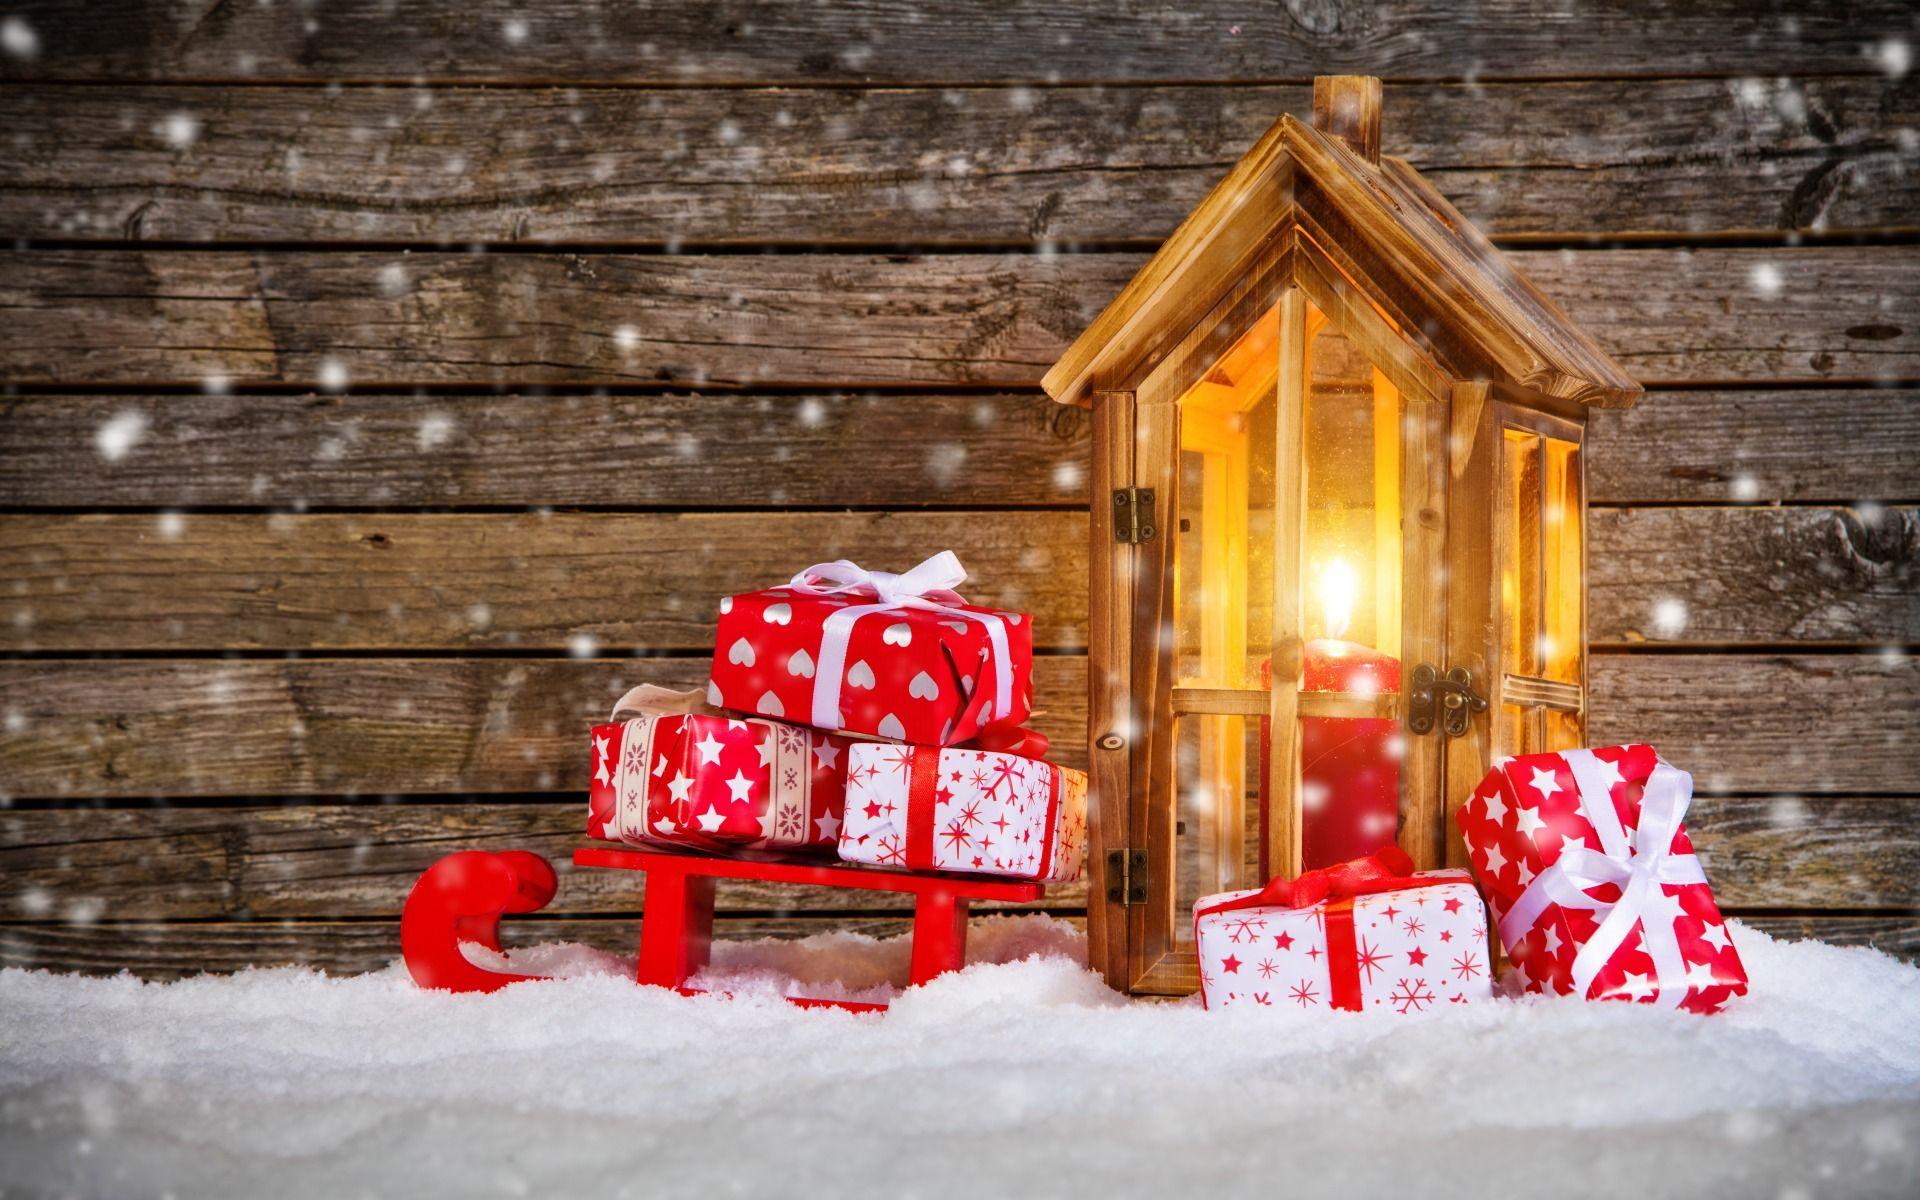 Download wallpaper winter lantern christmas sled candle snow download wallpaper winter lantern christmas sled candle snow snow negle Choice Image